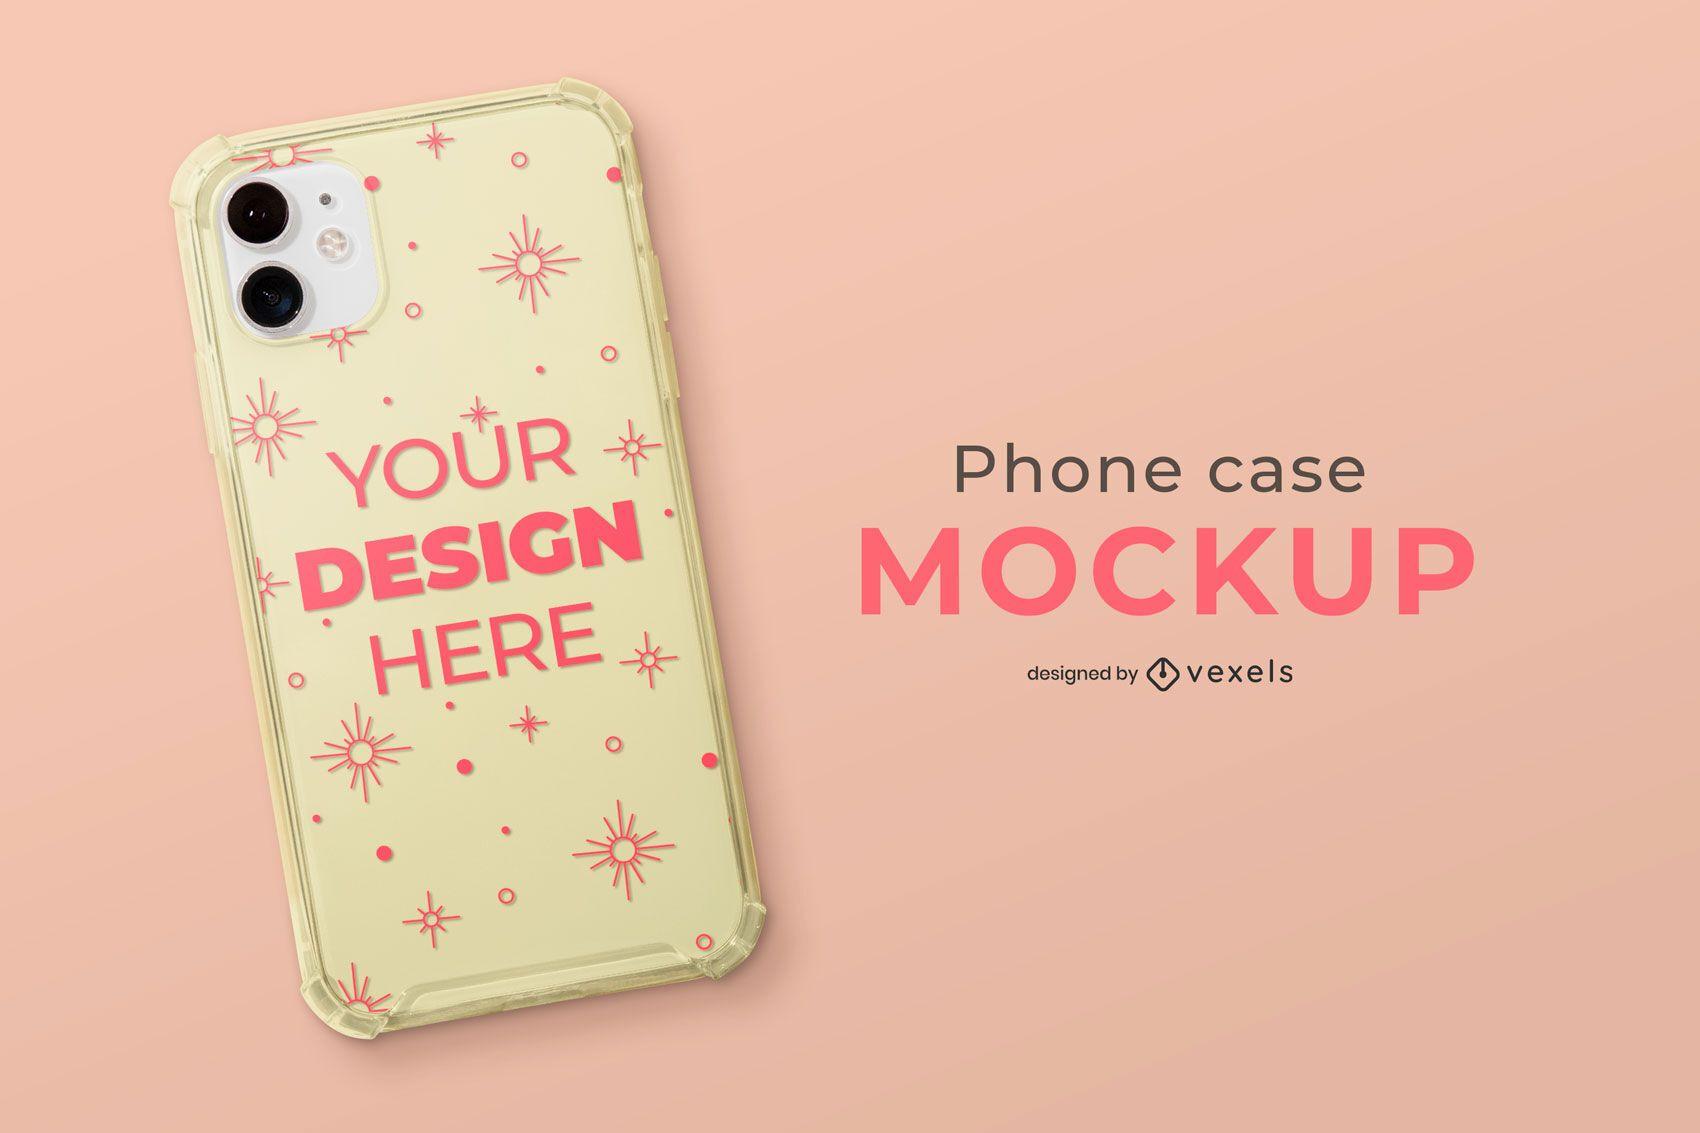 Simple phone case mockup design